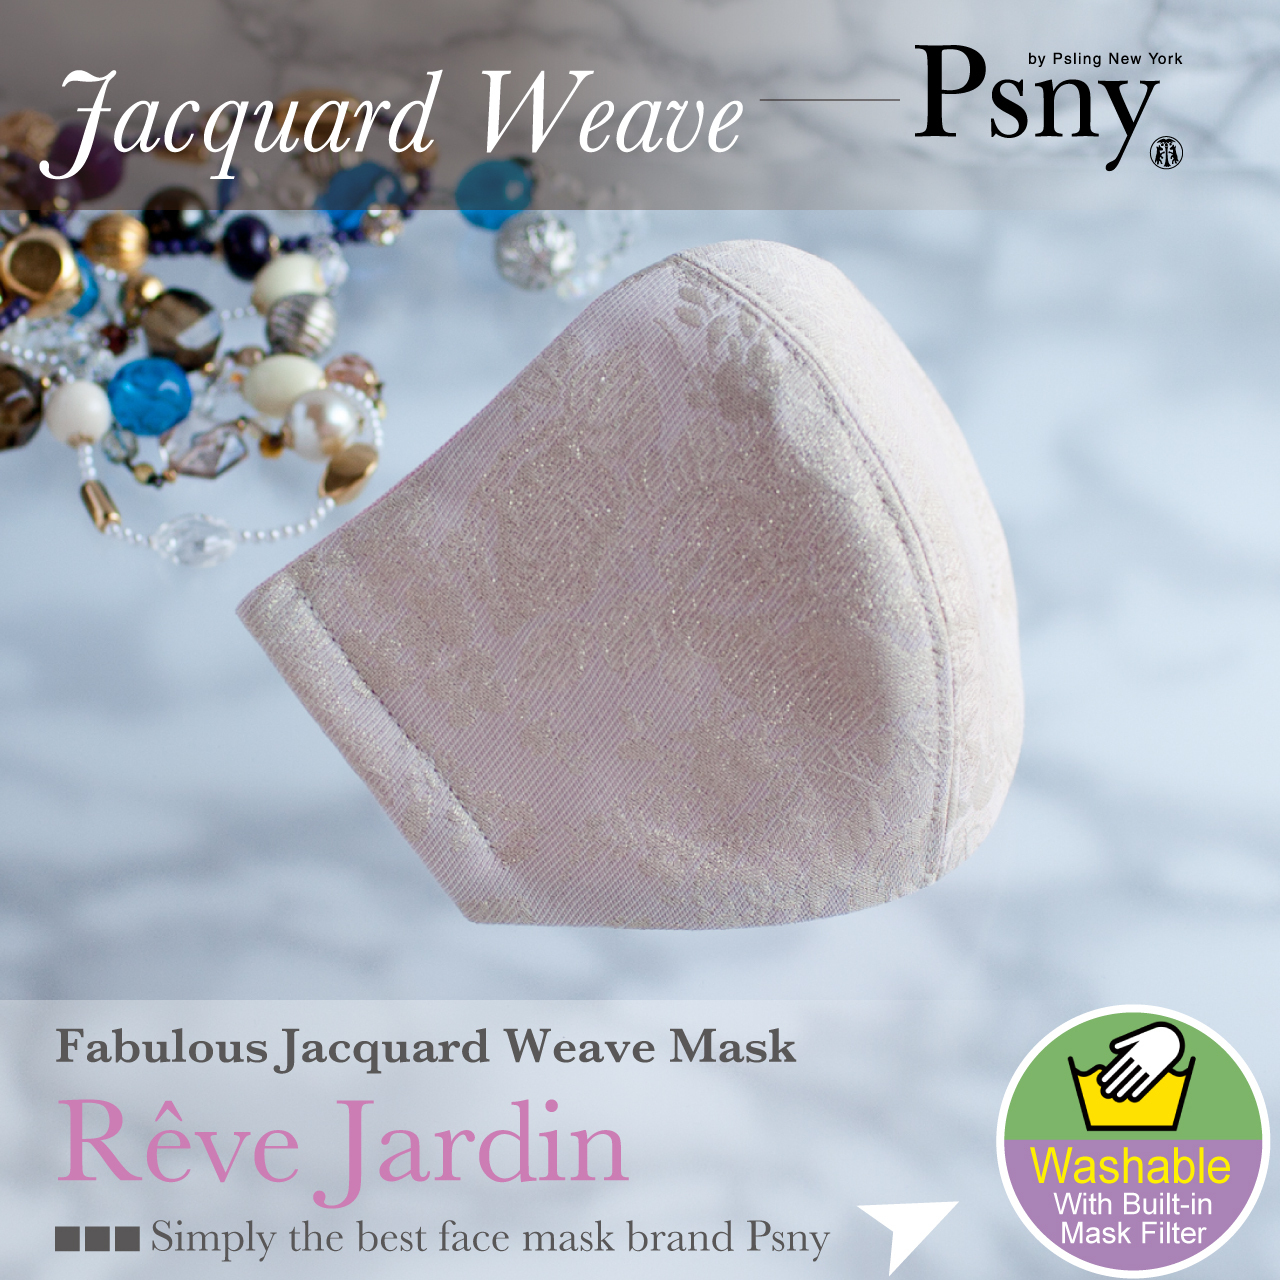 PSNY ジャガード レーヴ ジャルダン 花粉 黄砂 洗えるフィルター入り 立体 着物 大人 美しい マスク 送料無料 FJ5